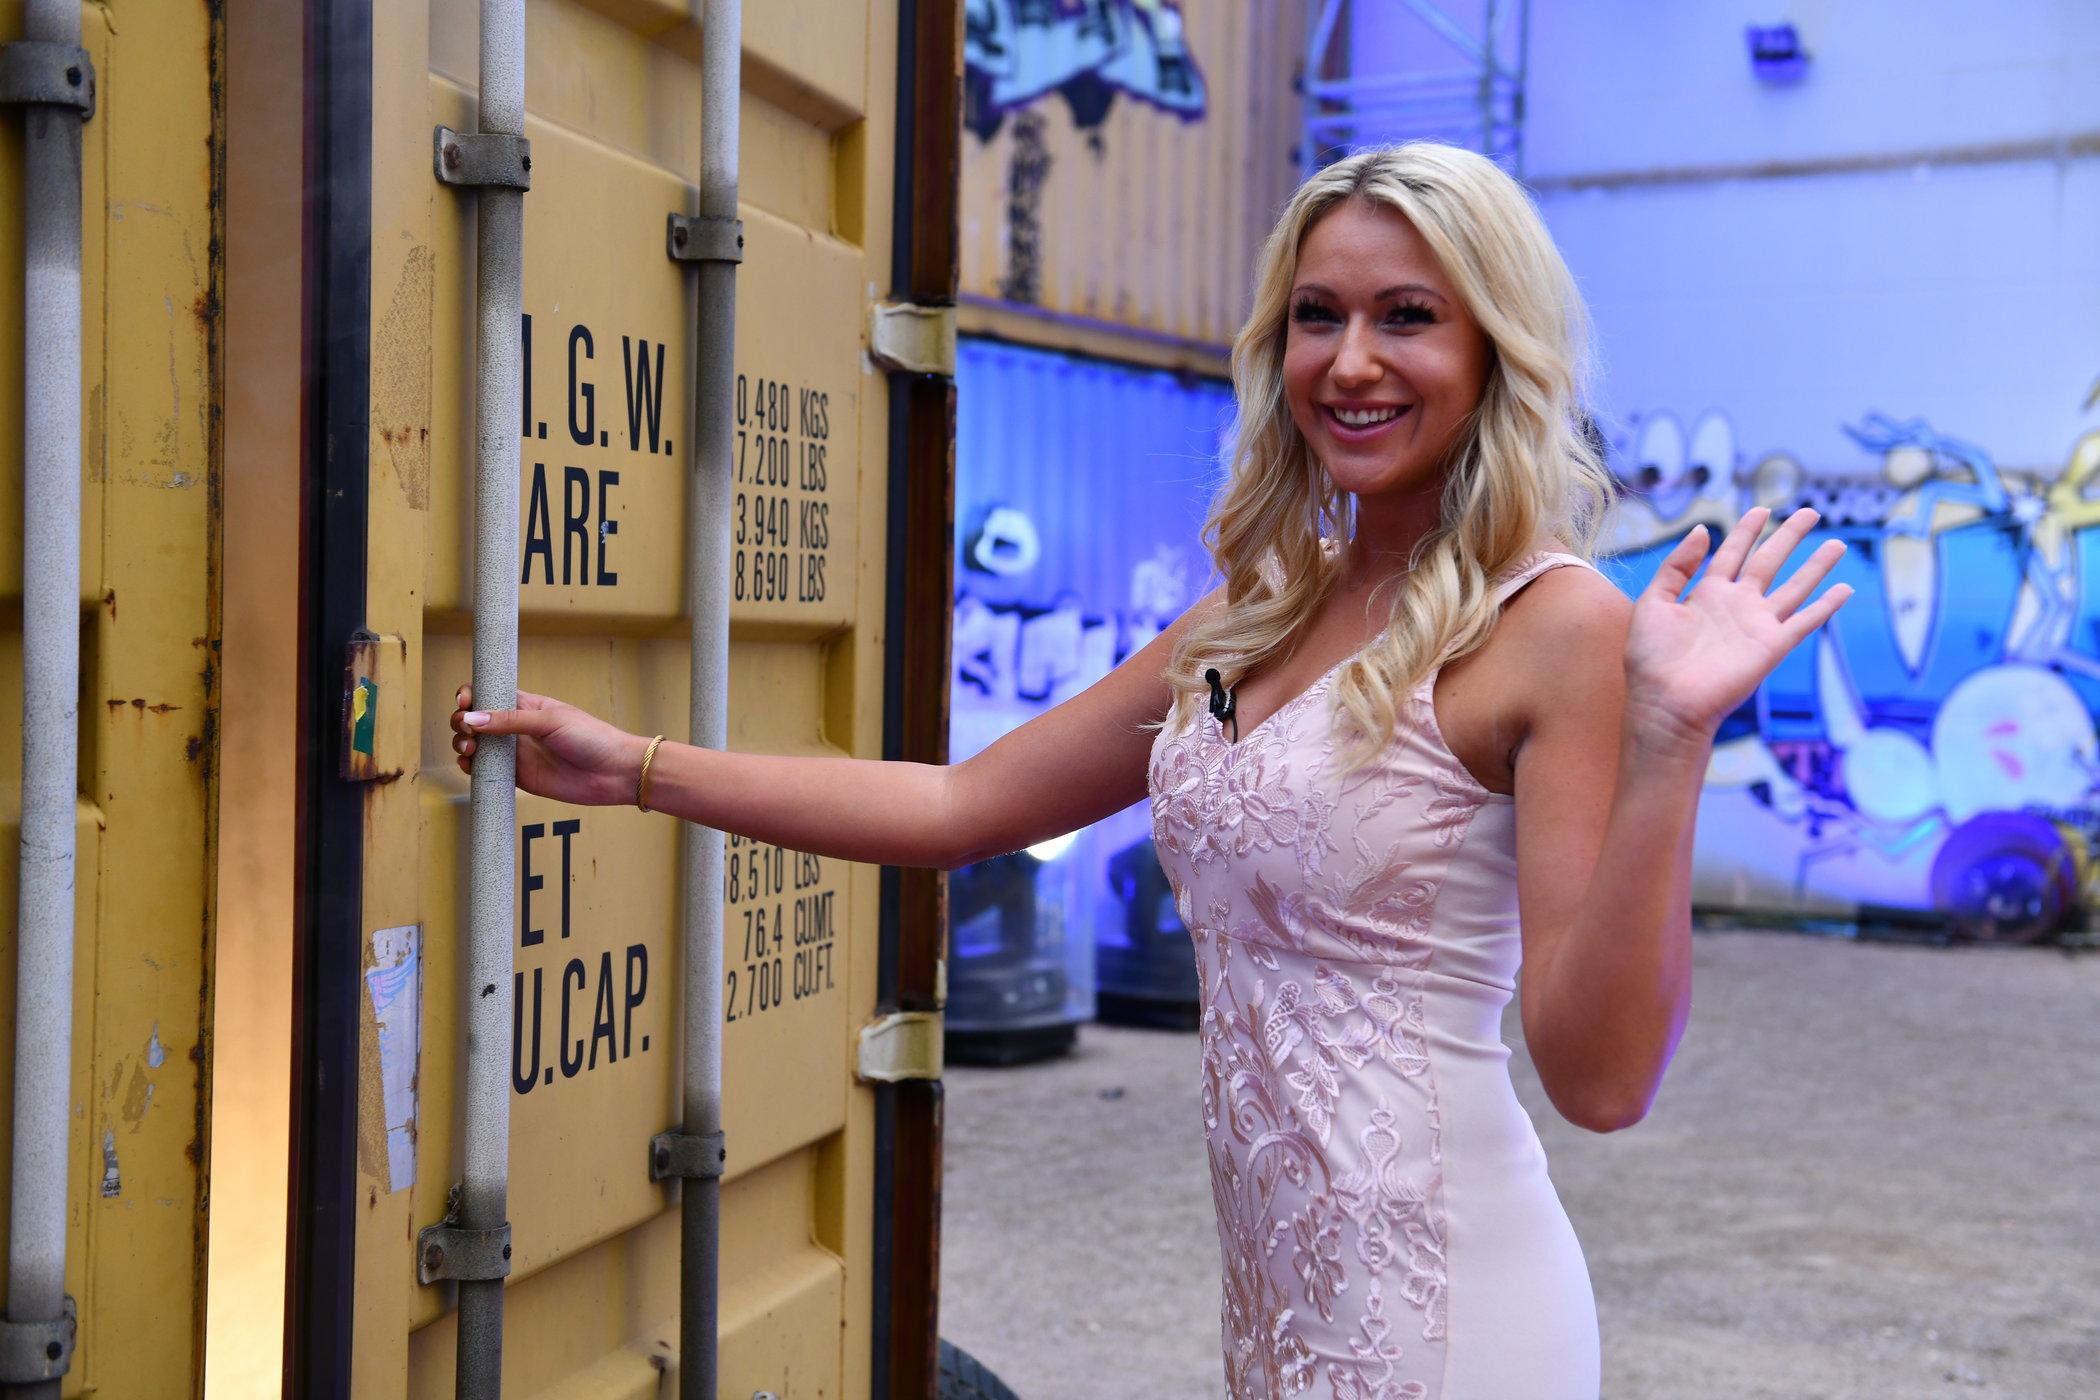 Promi Big Brother 2018 Einzug Chethrin Schulze